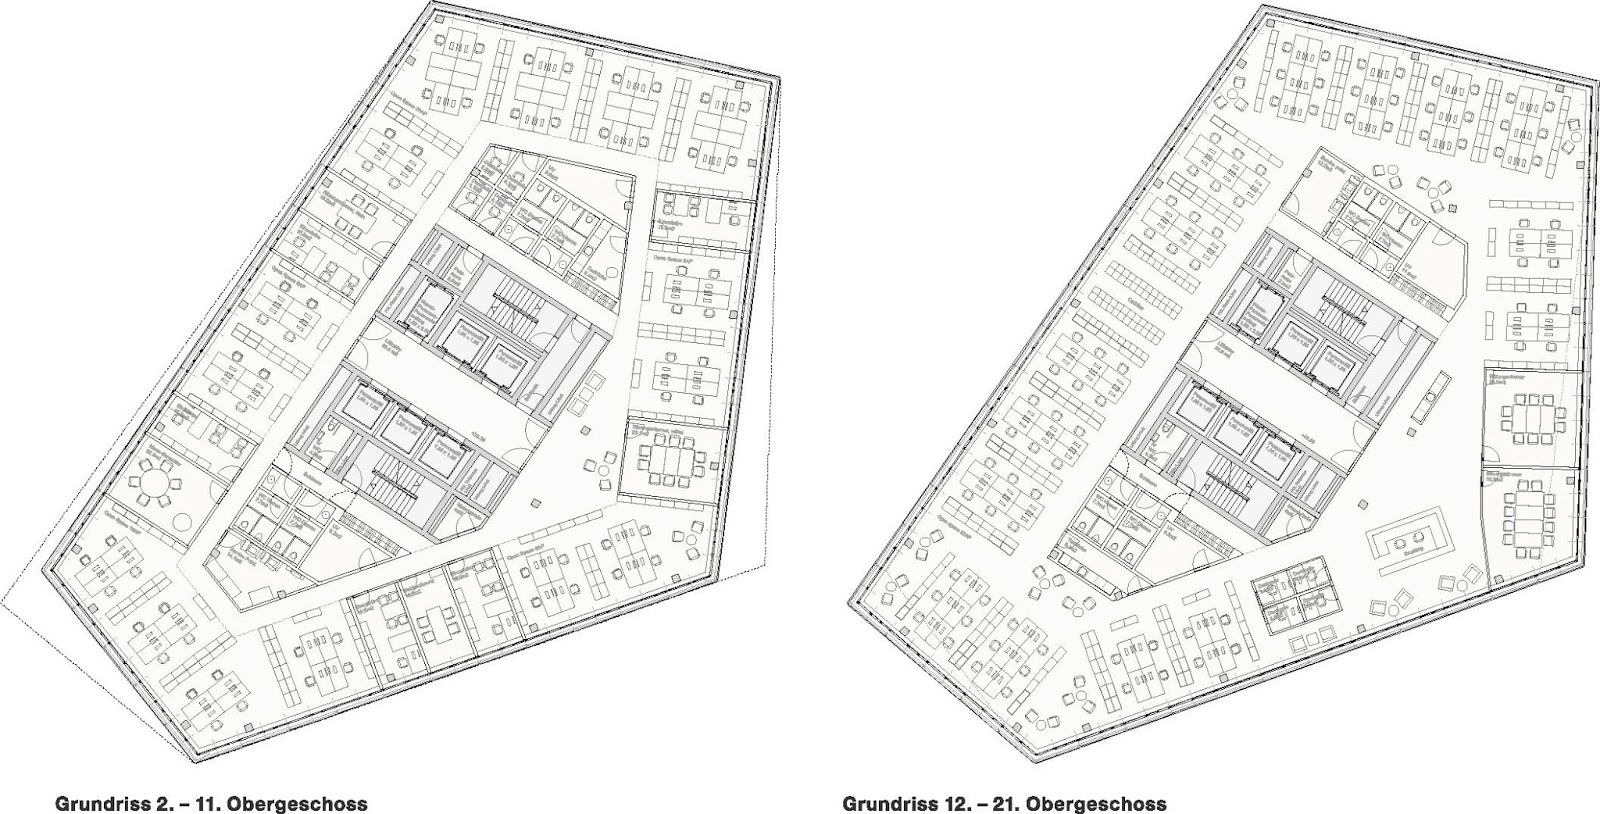 GigonGuyer+Architekten+.+Andreasturm+Office+Building+